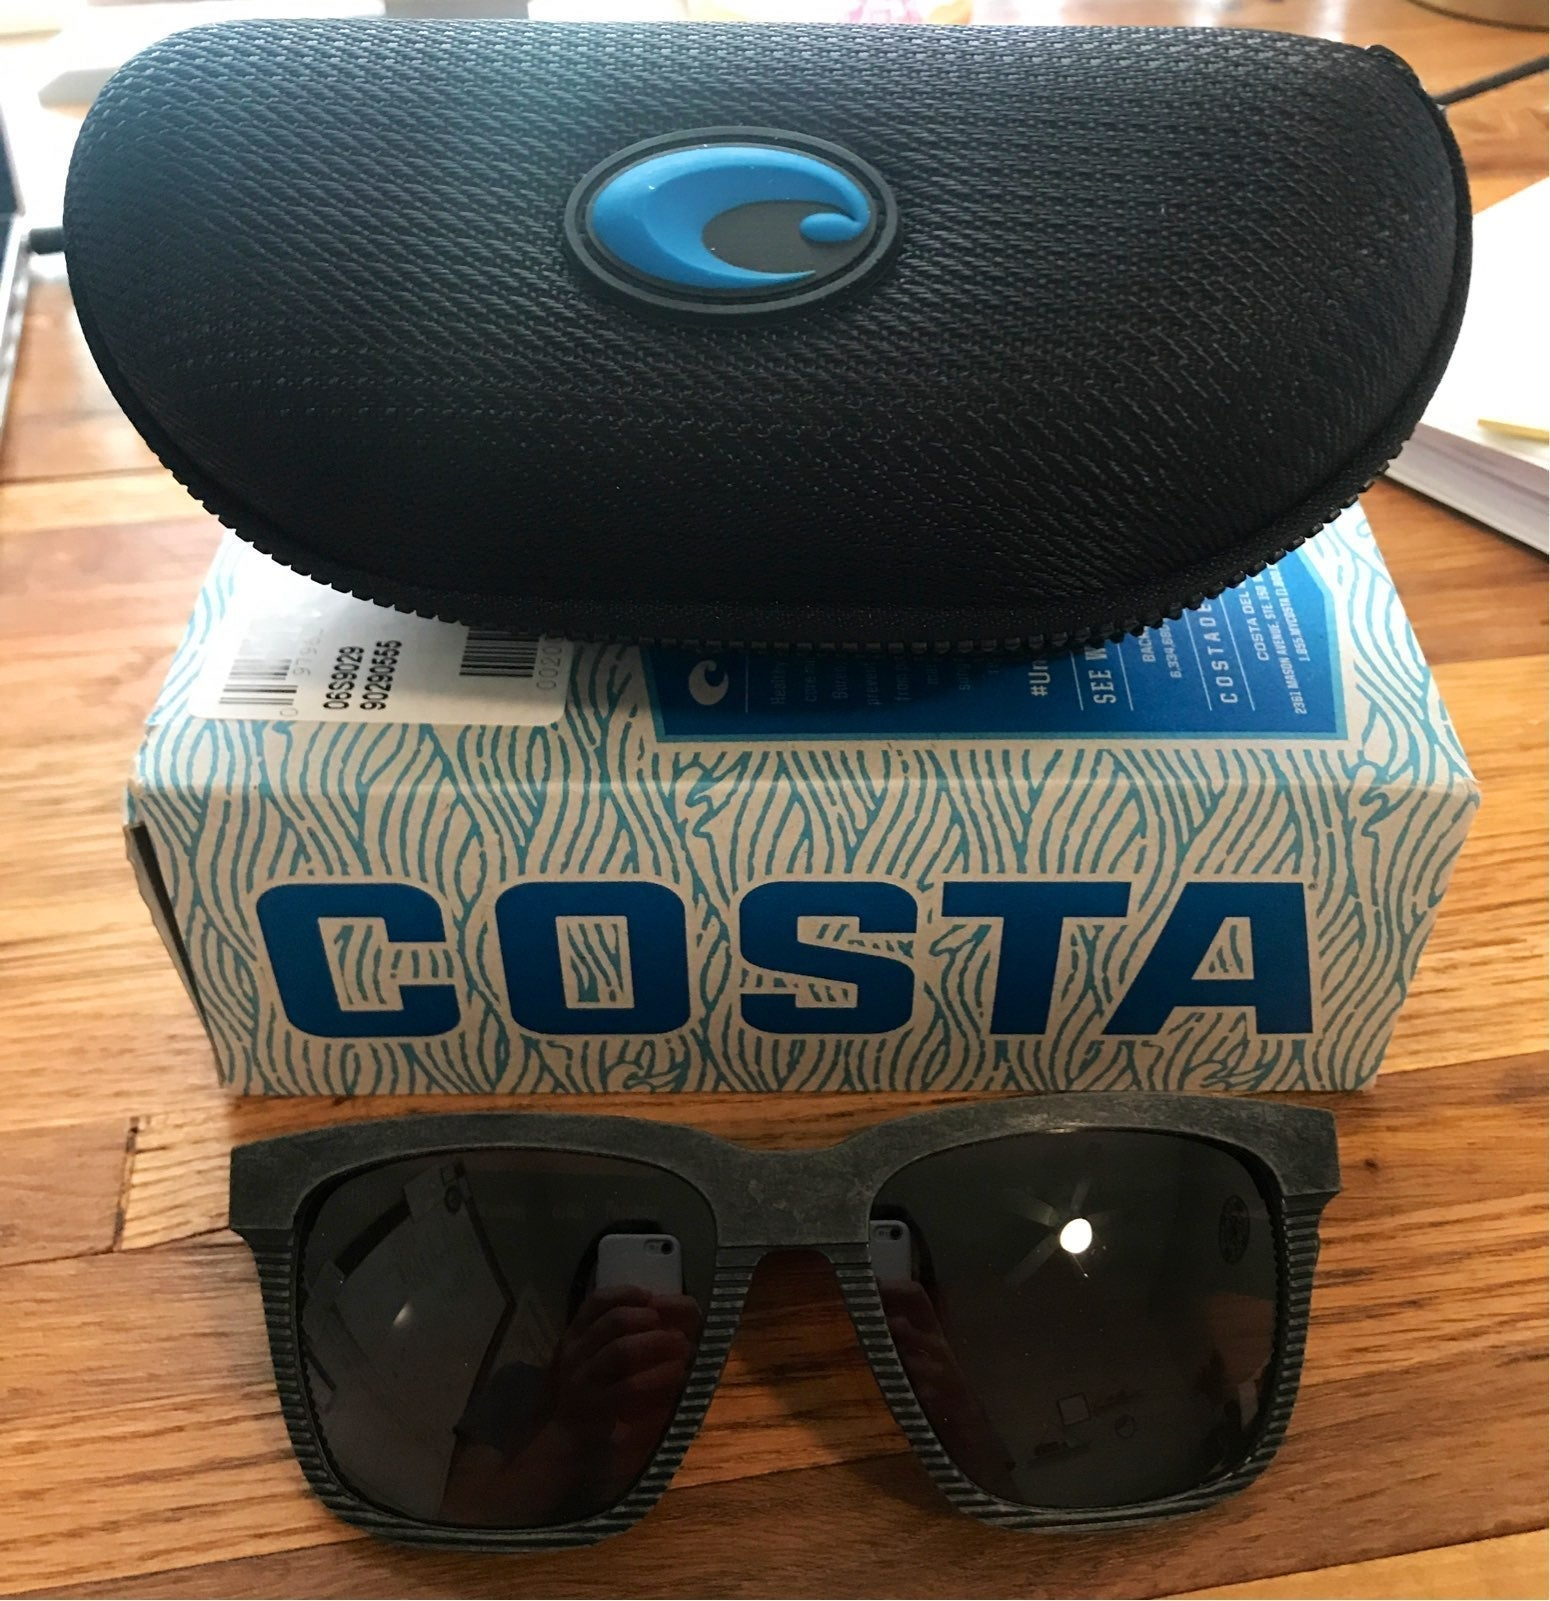 Brand New Costa sunglasses 580G